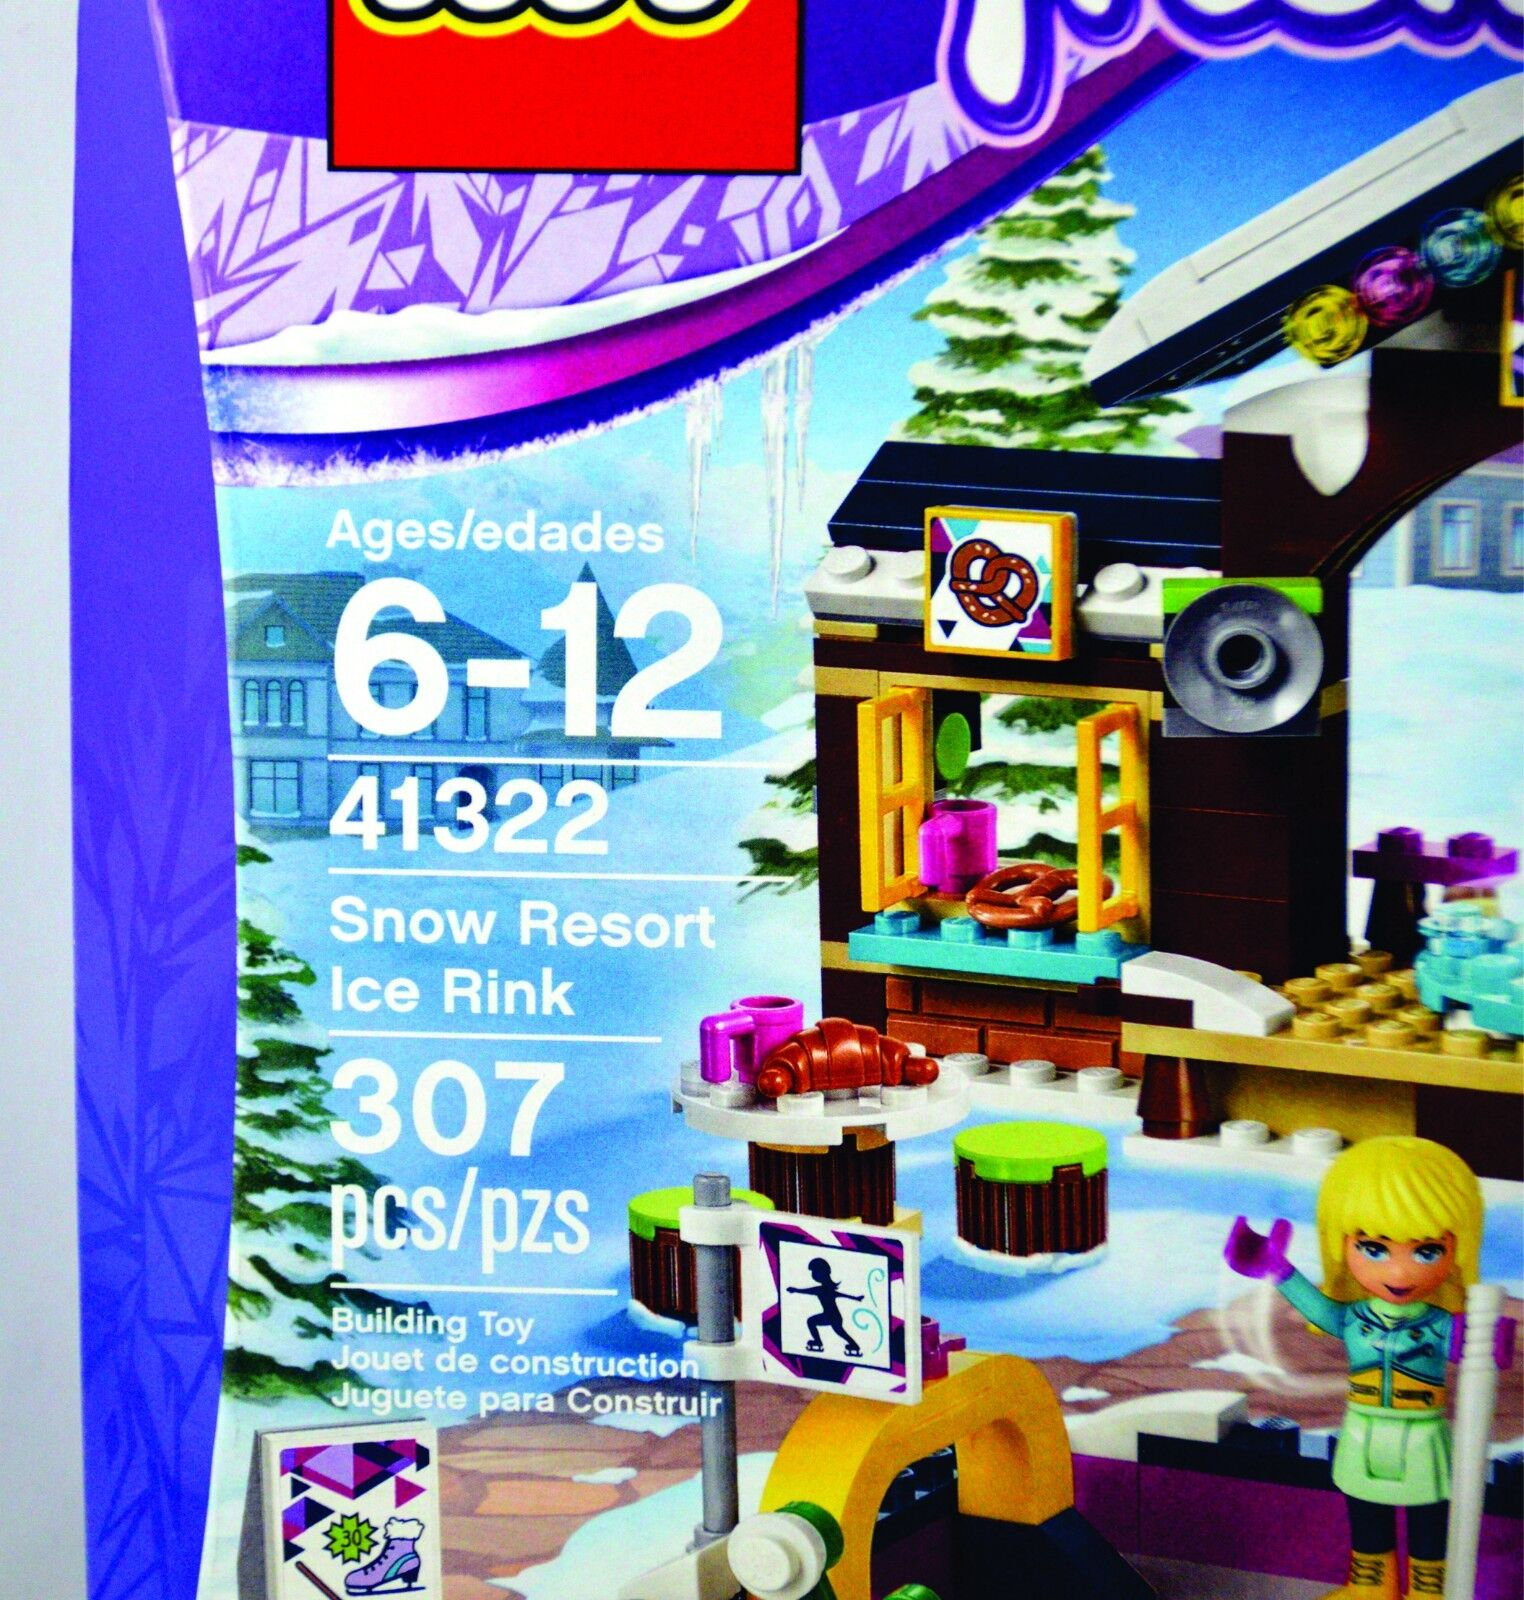 Resort Ice Toy Building Pcs Rink 307 41322 Friends Snow Lego BedrCWxo